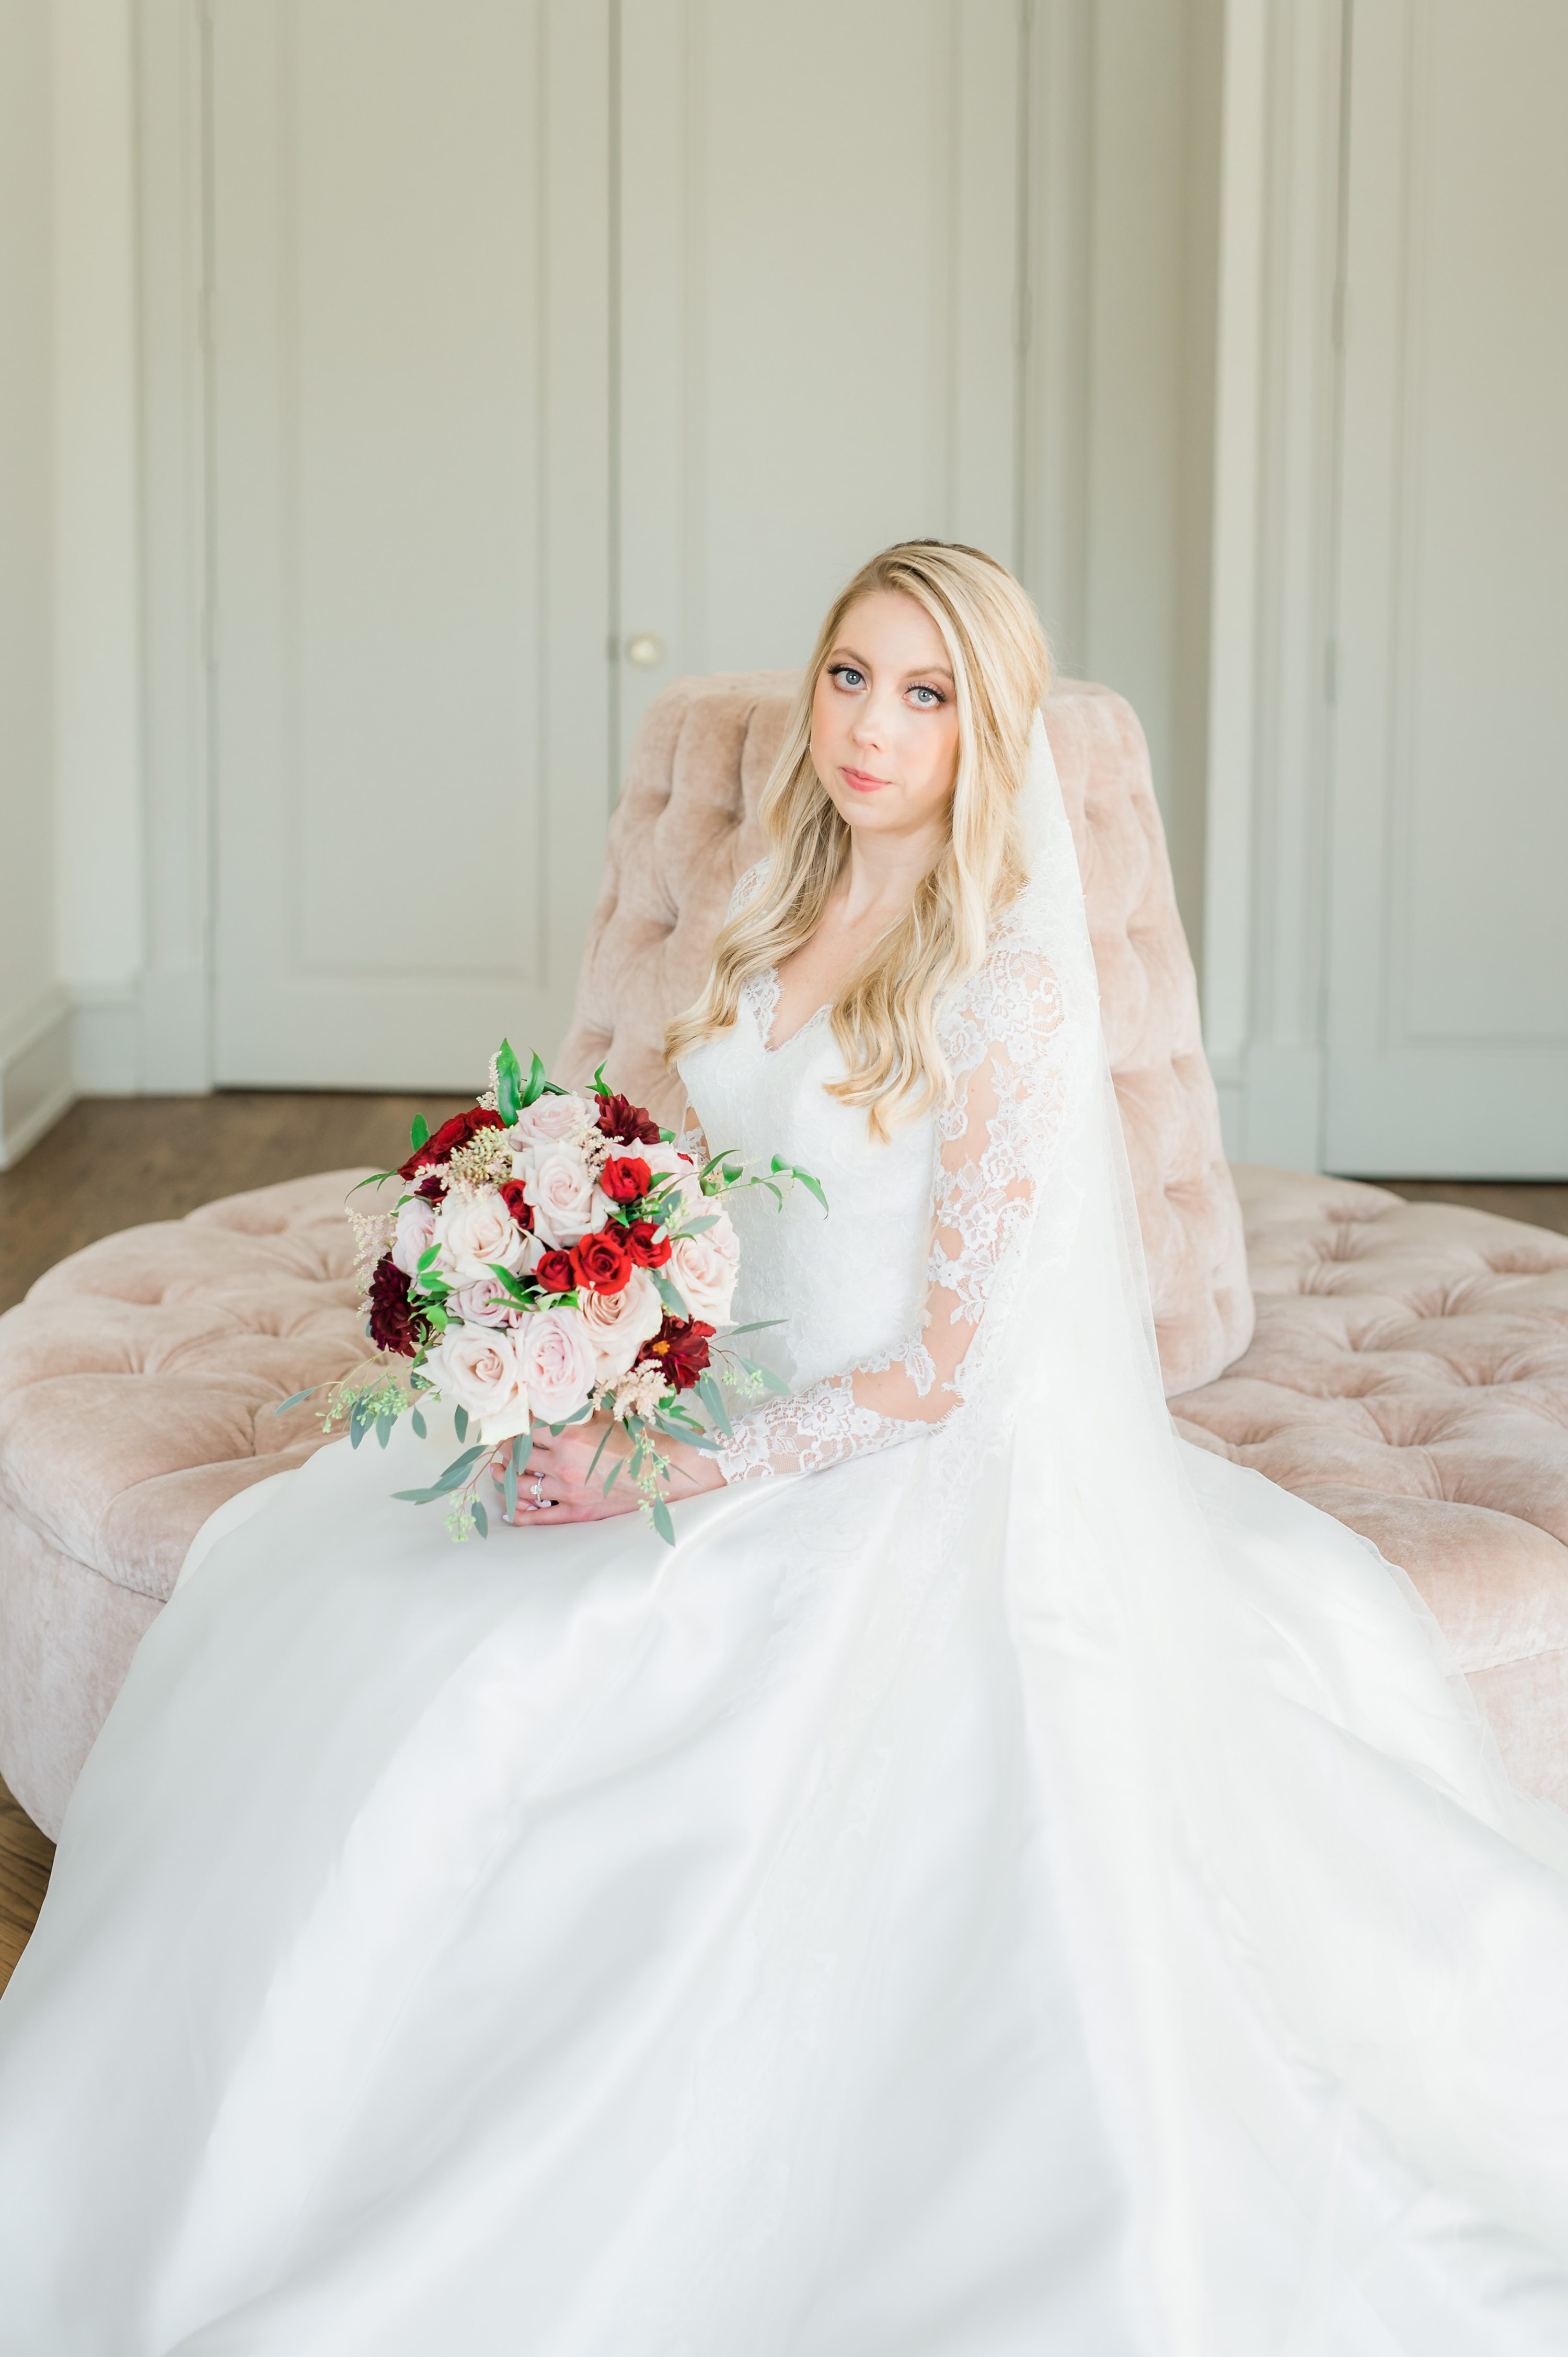 Houston Wedding,Eric & Jenn Photography